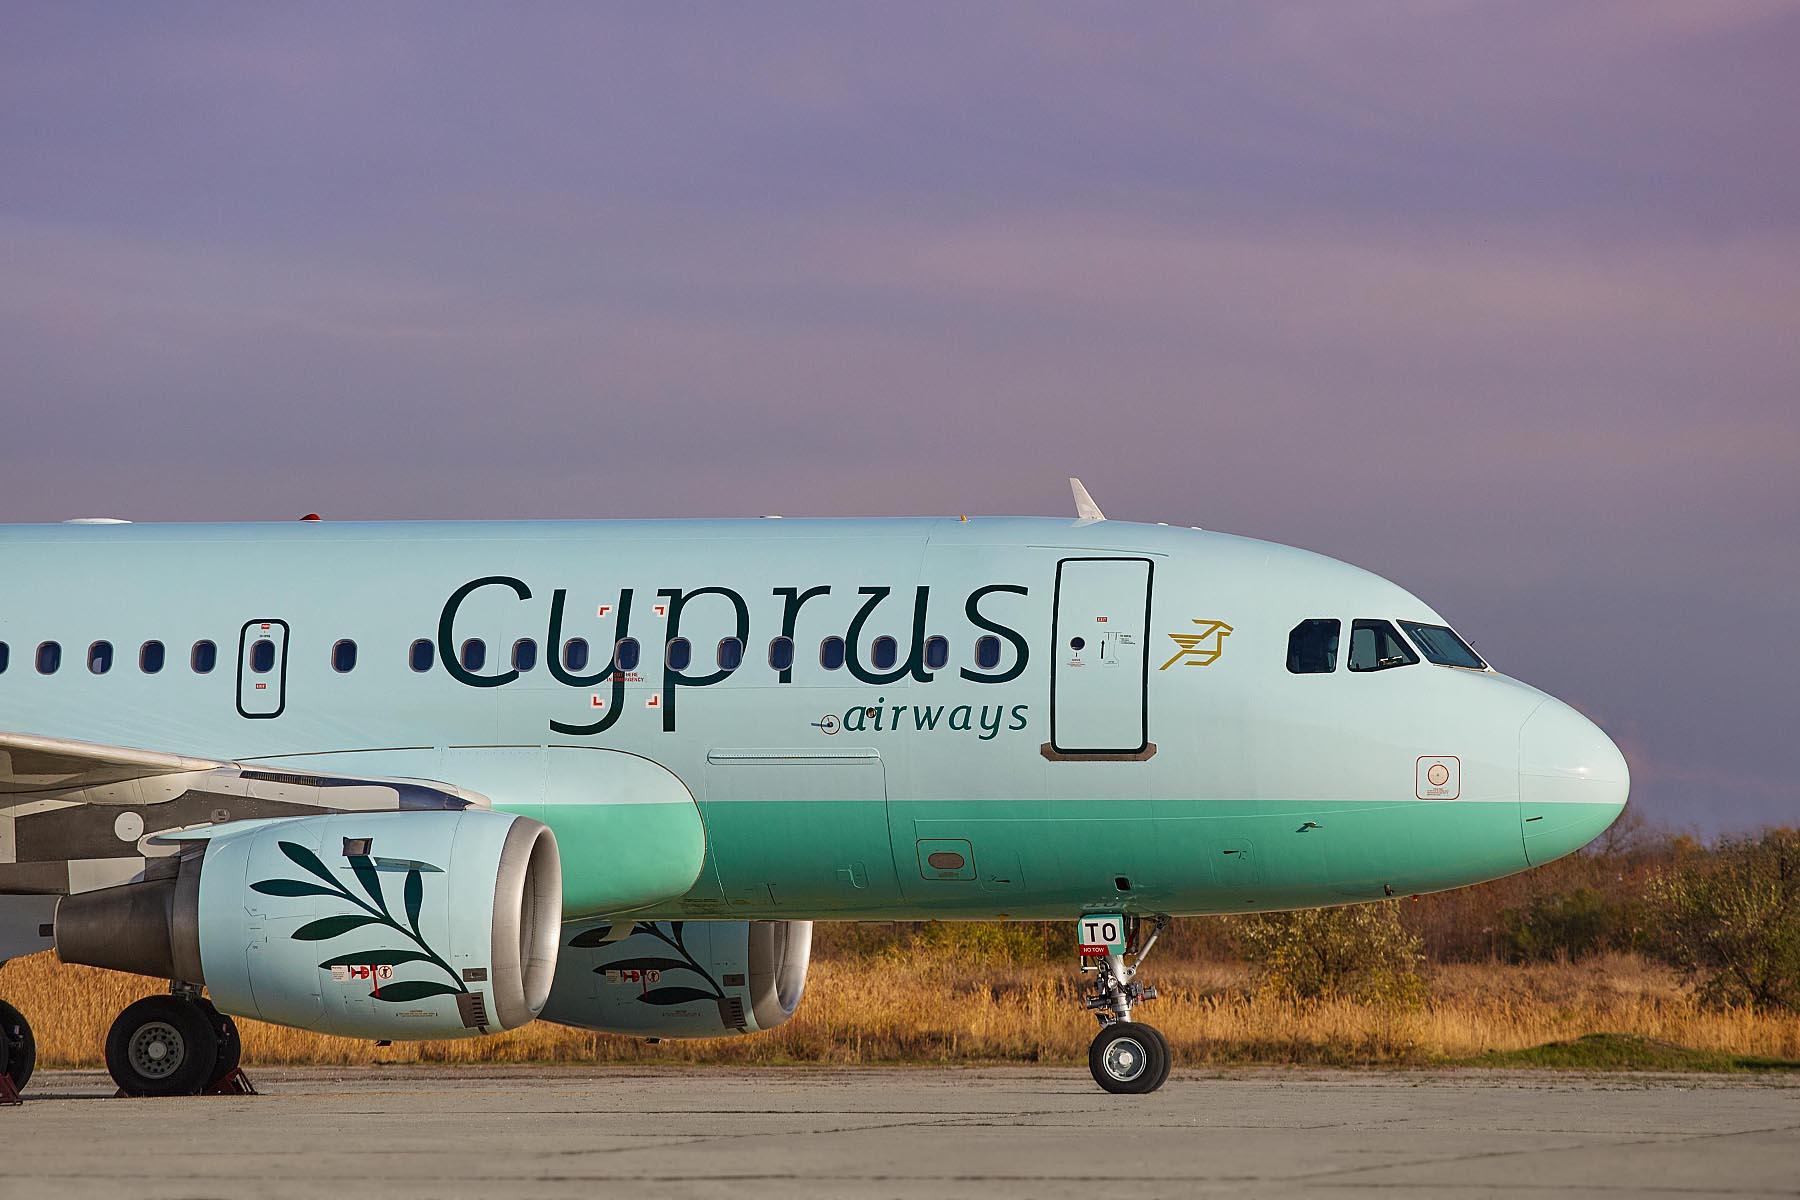 Лайнер Кипрских авиалиний в аэропорту